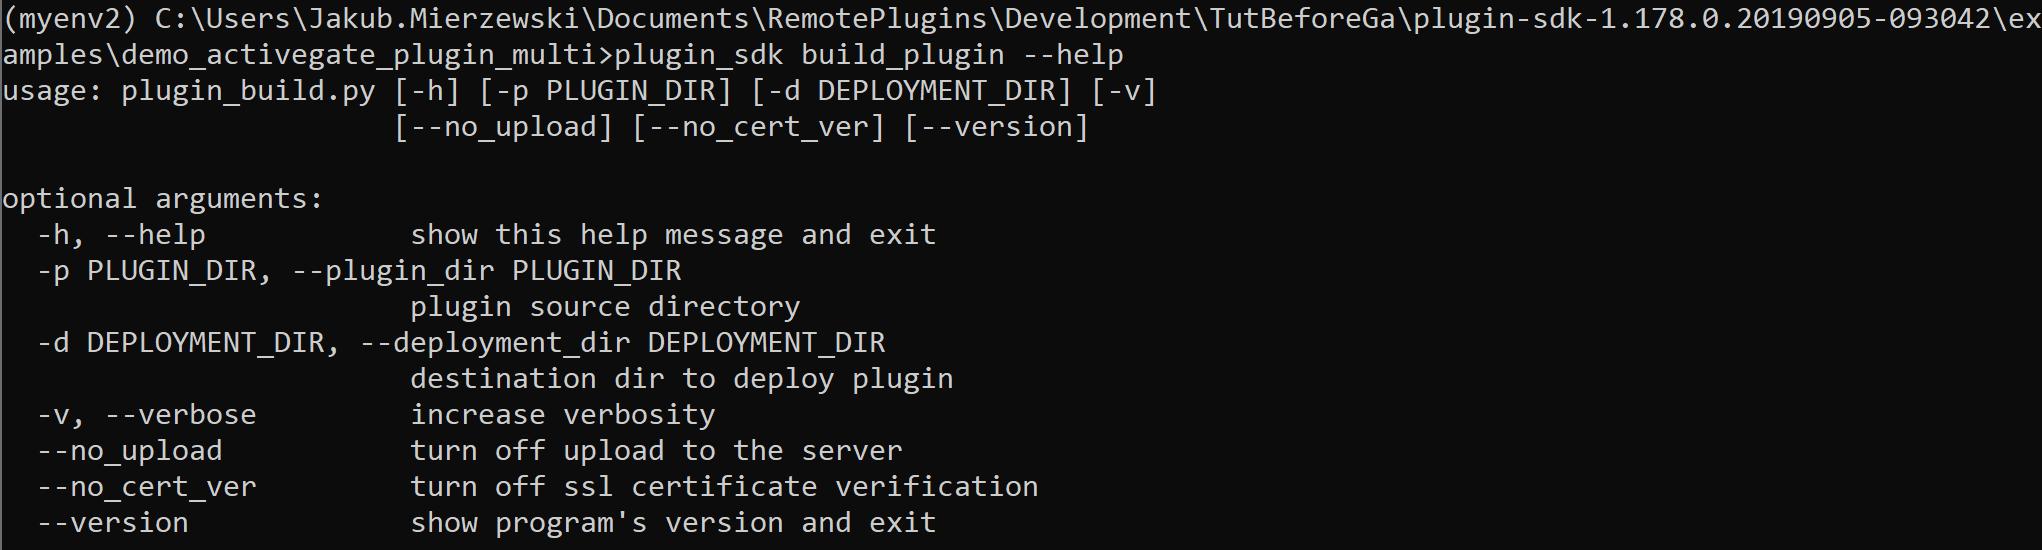 ActiveGate plugin framework inline help